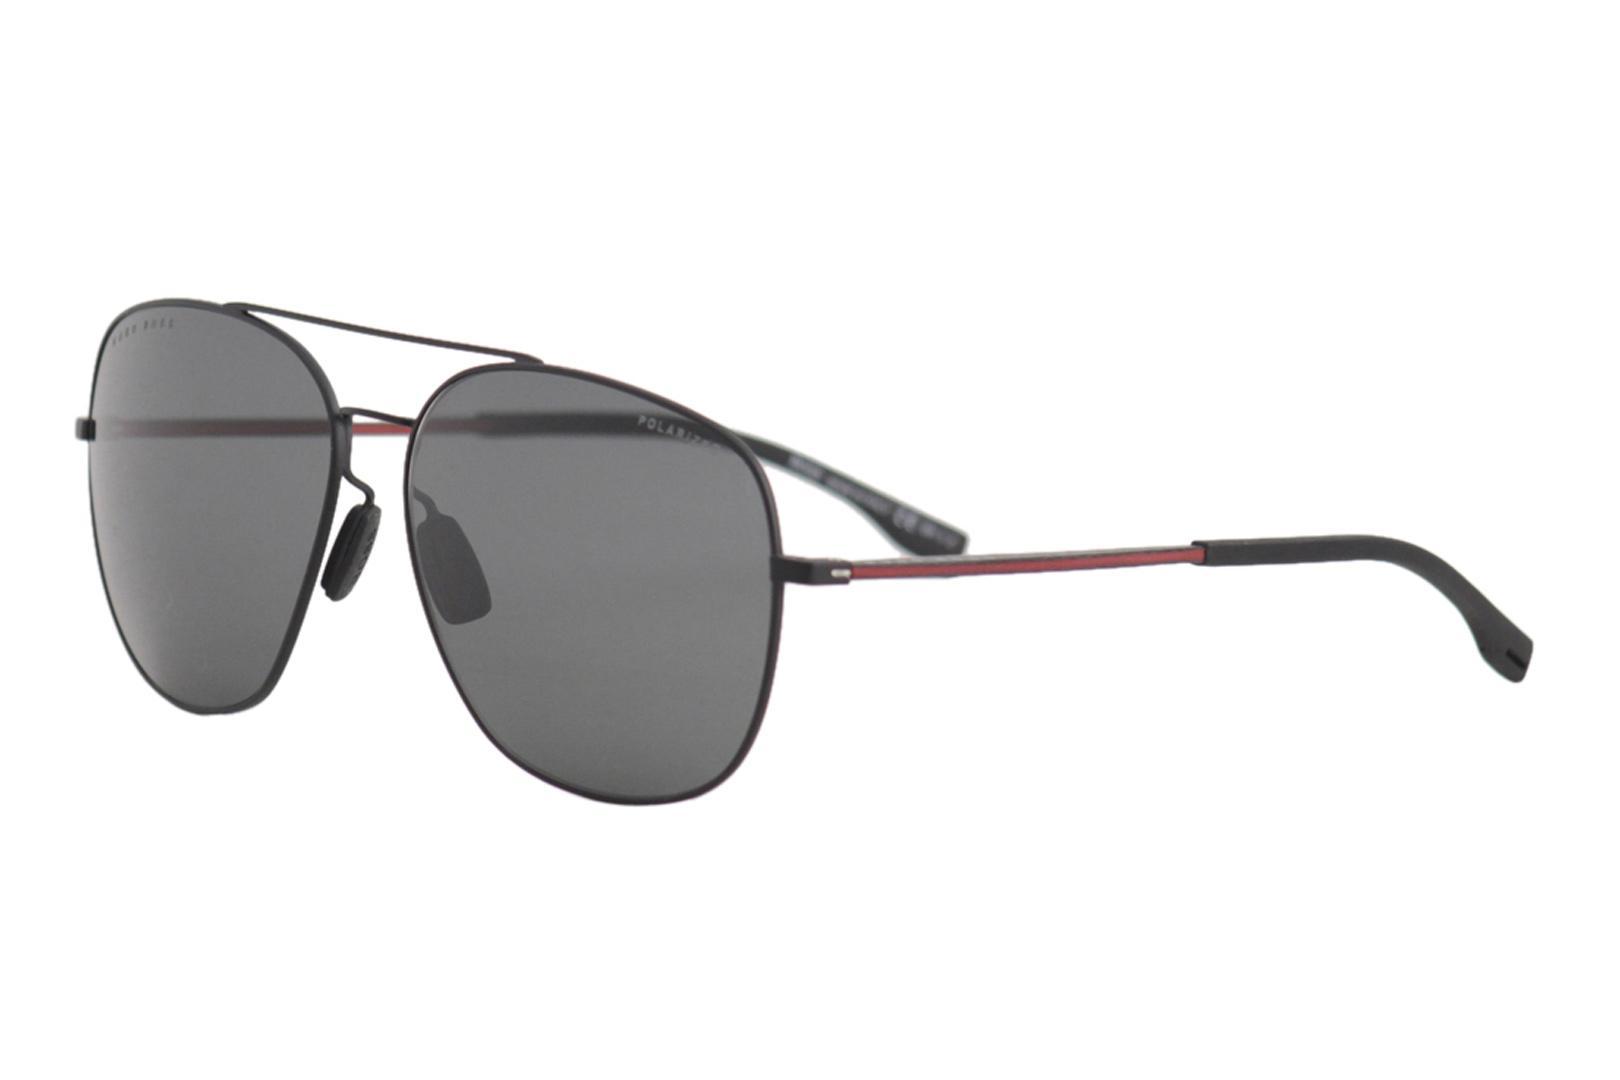 3f90cb8f83 Hugo Boss Men s 1032FS 1032 F S Fashion Pilot Polarized Sunglasses